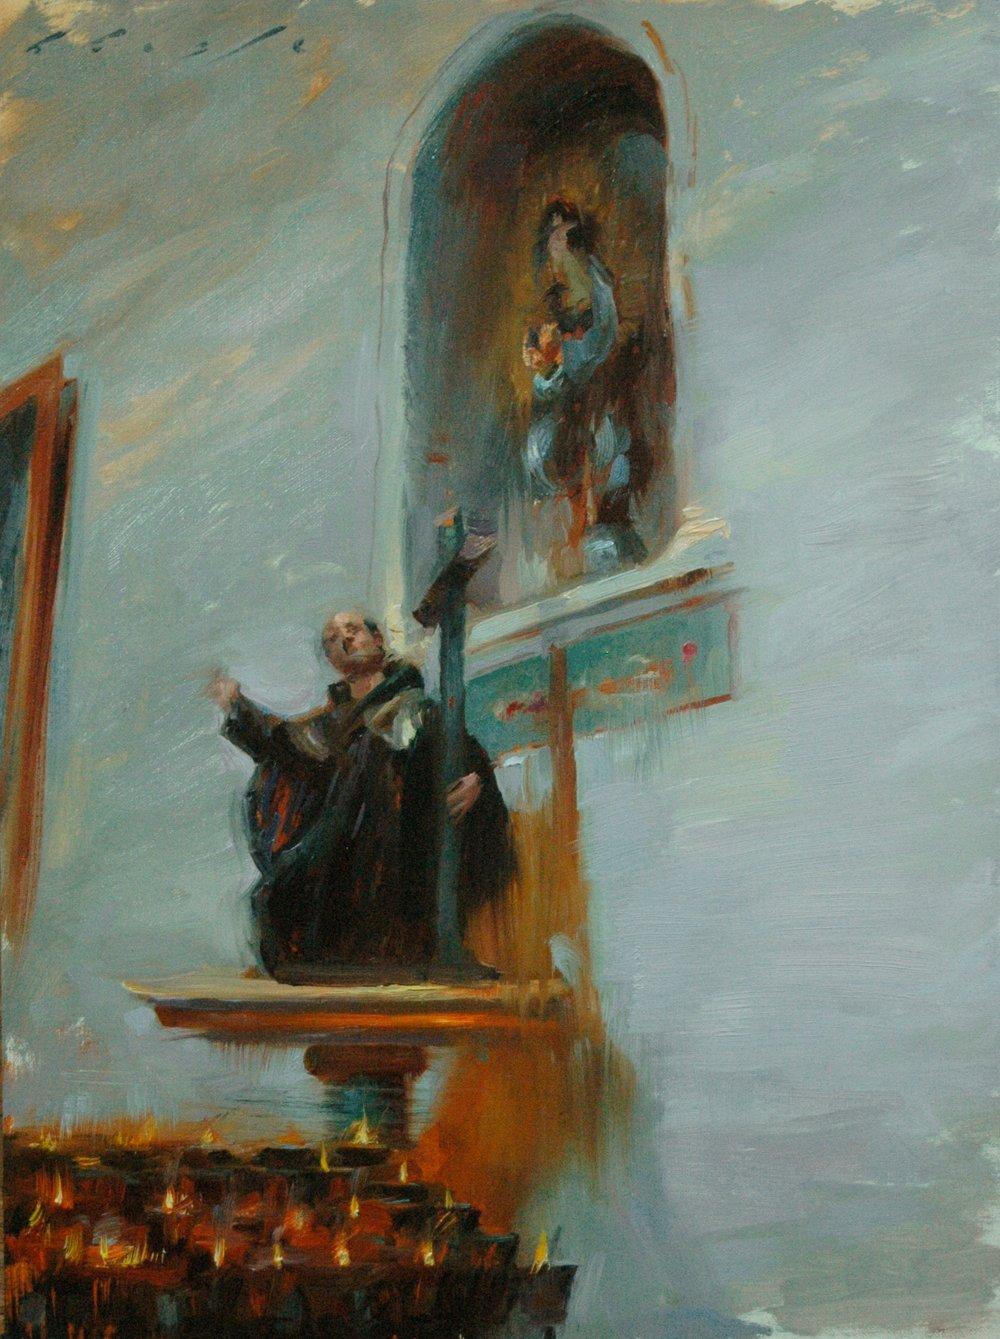 Saint and Alcove 12x16